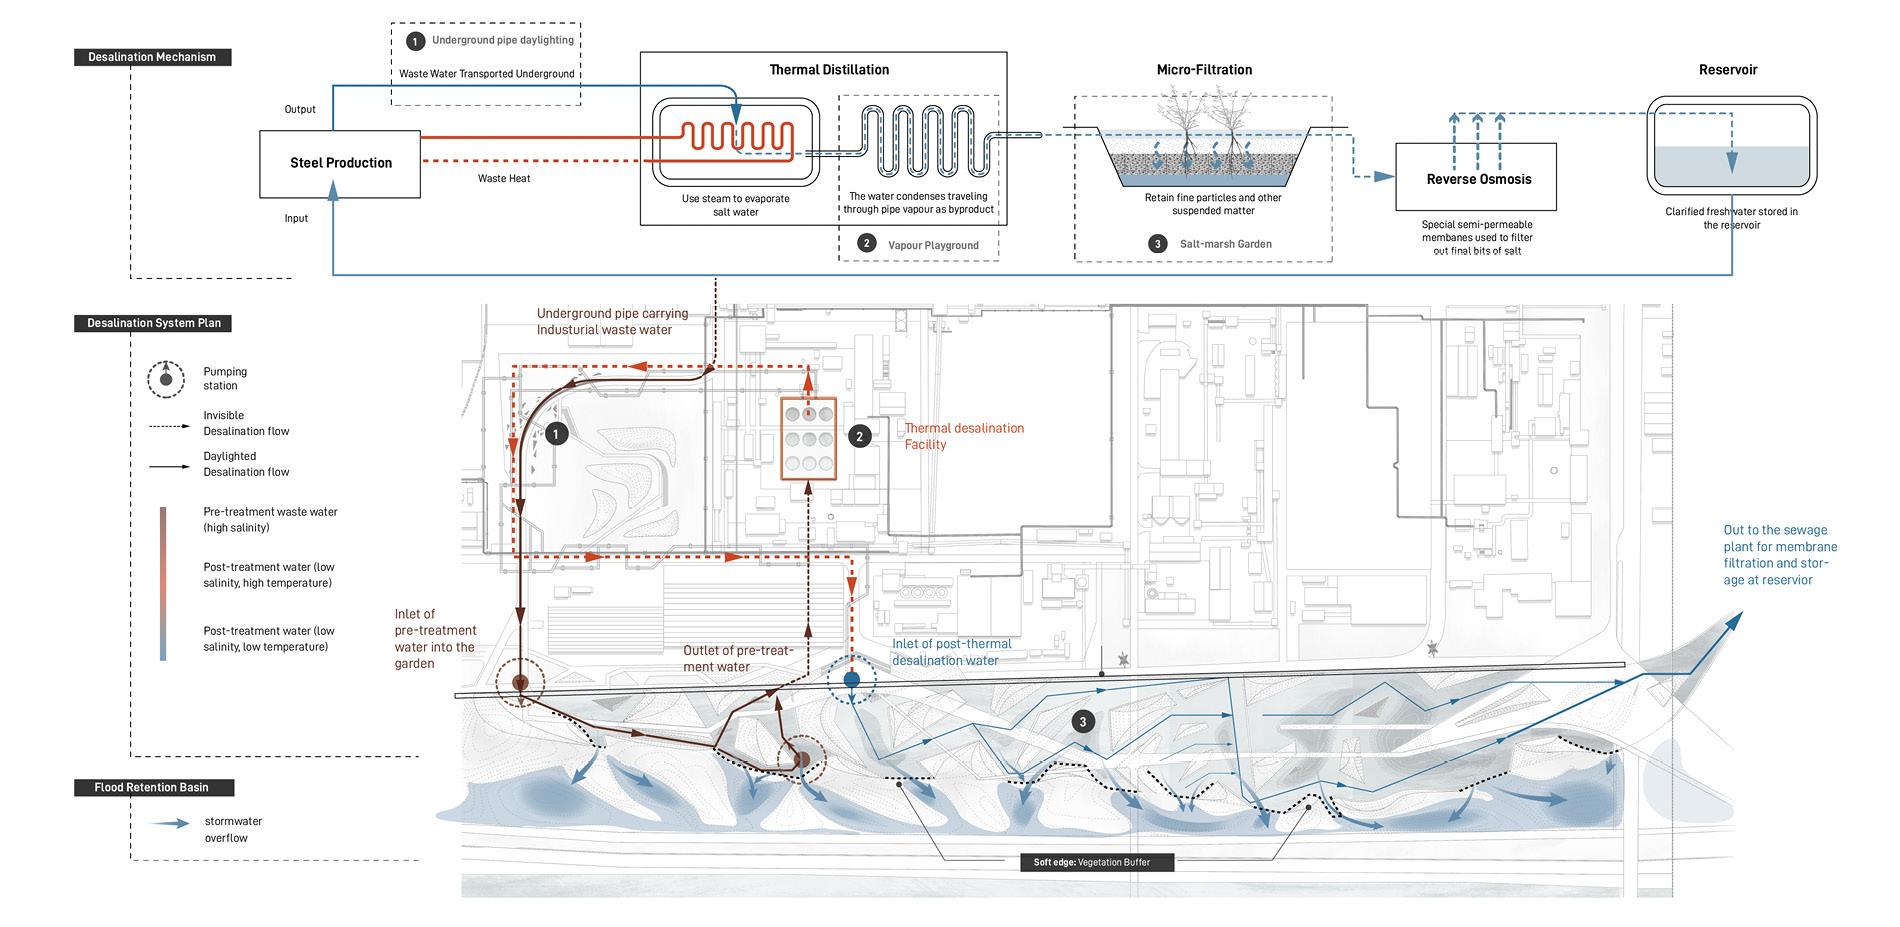 Desalination Mechanism